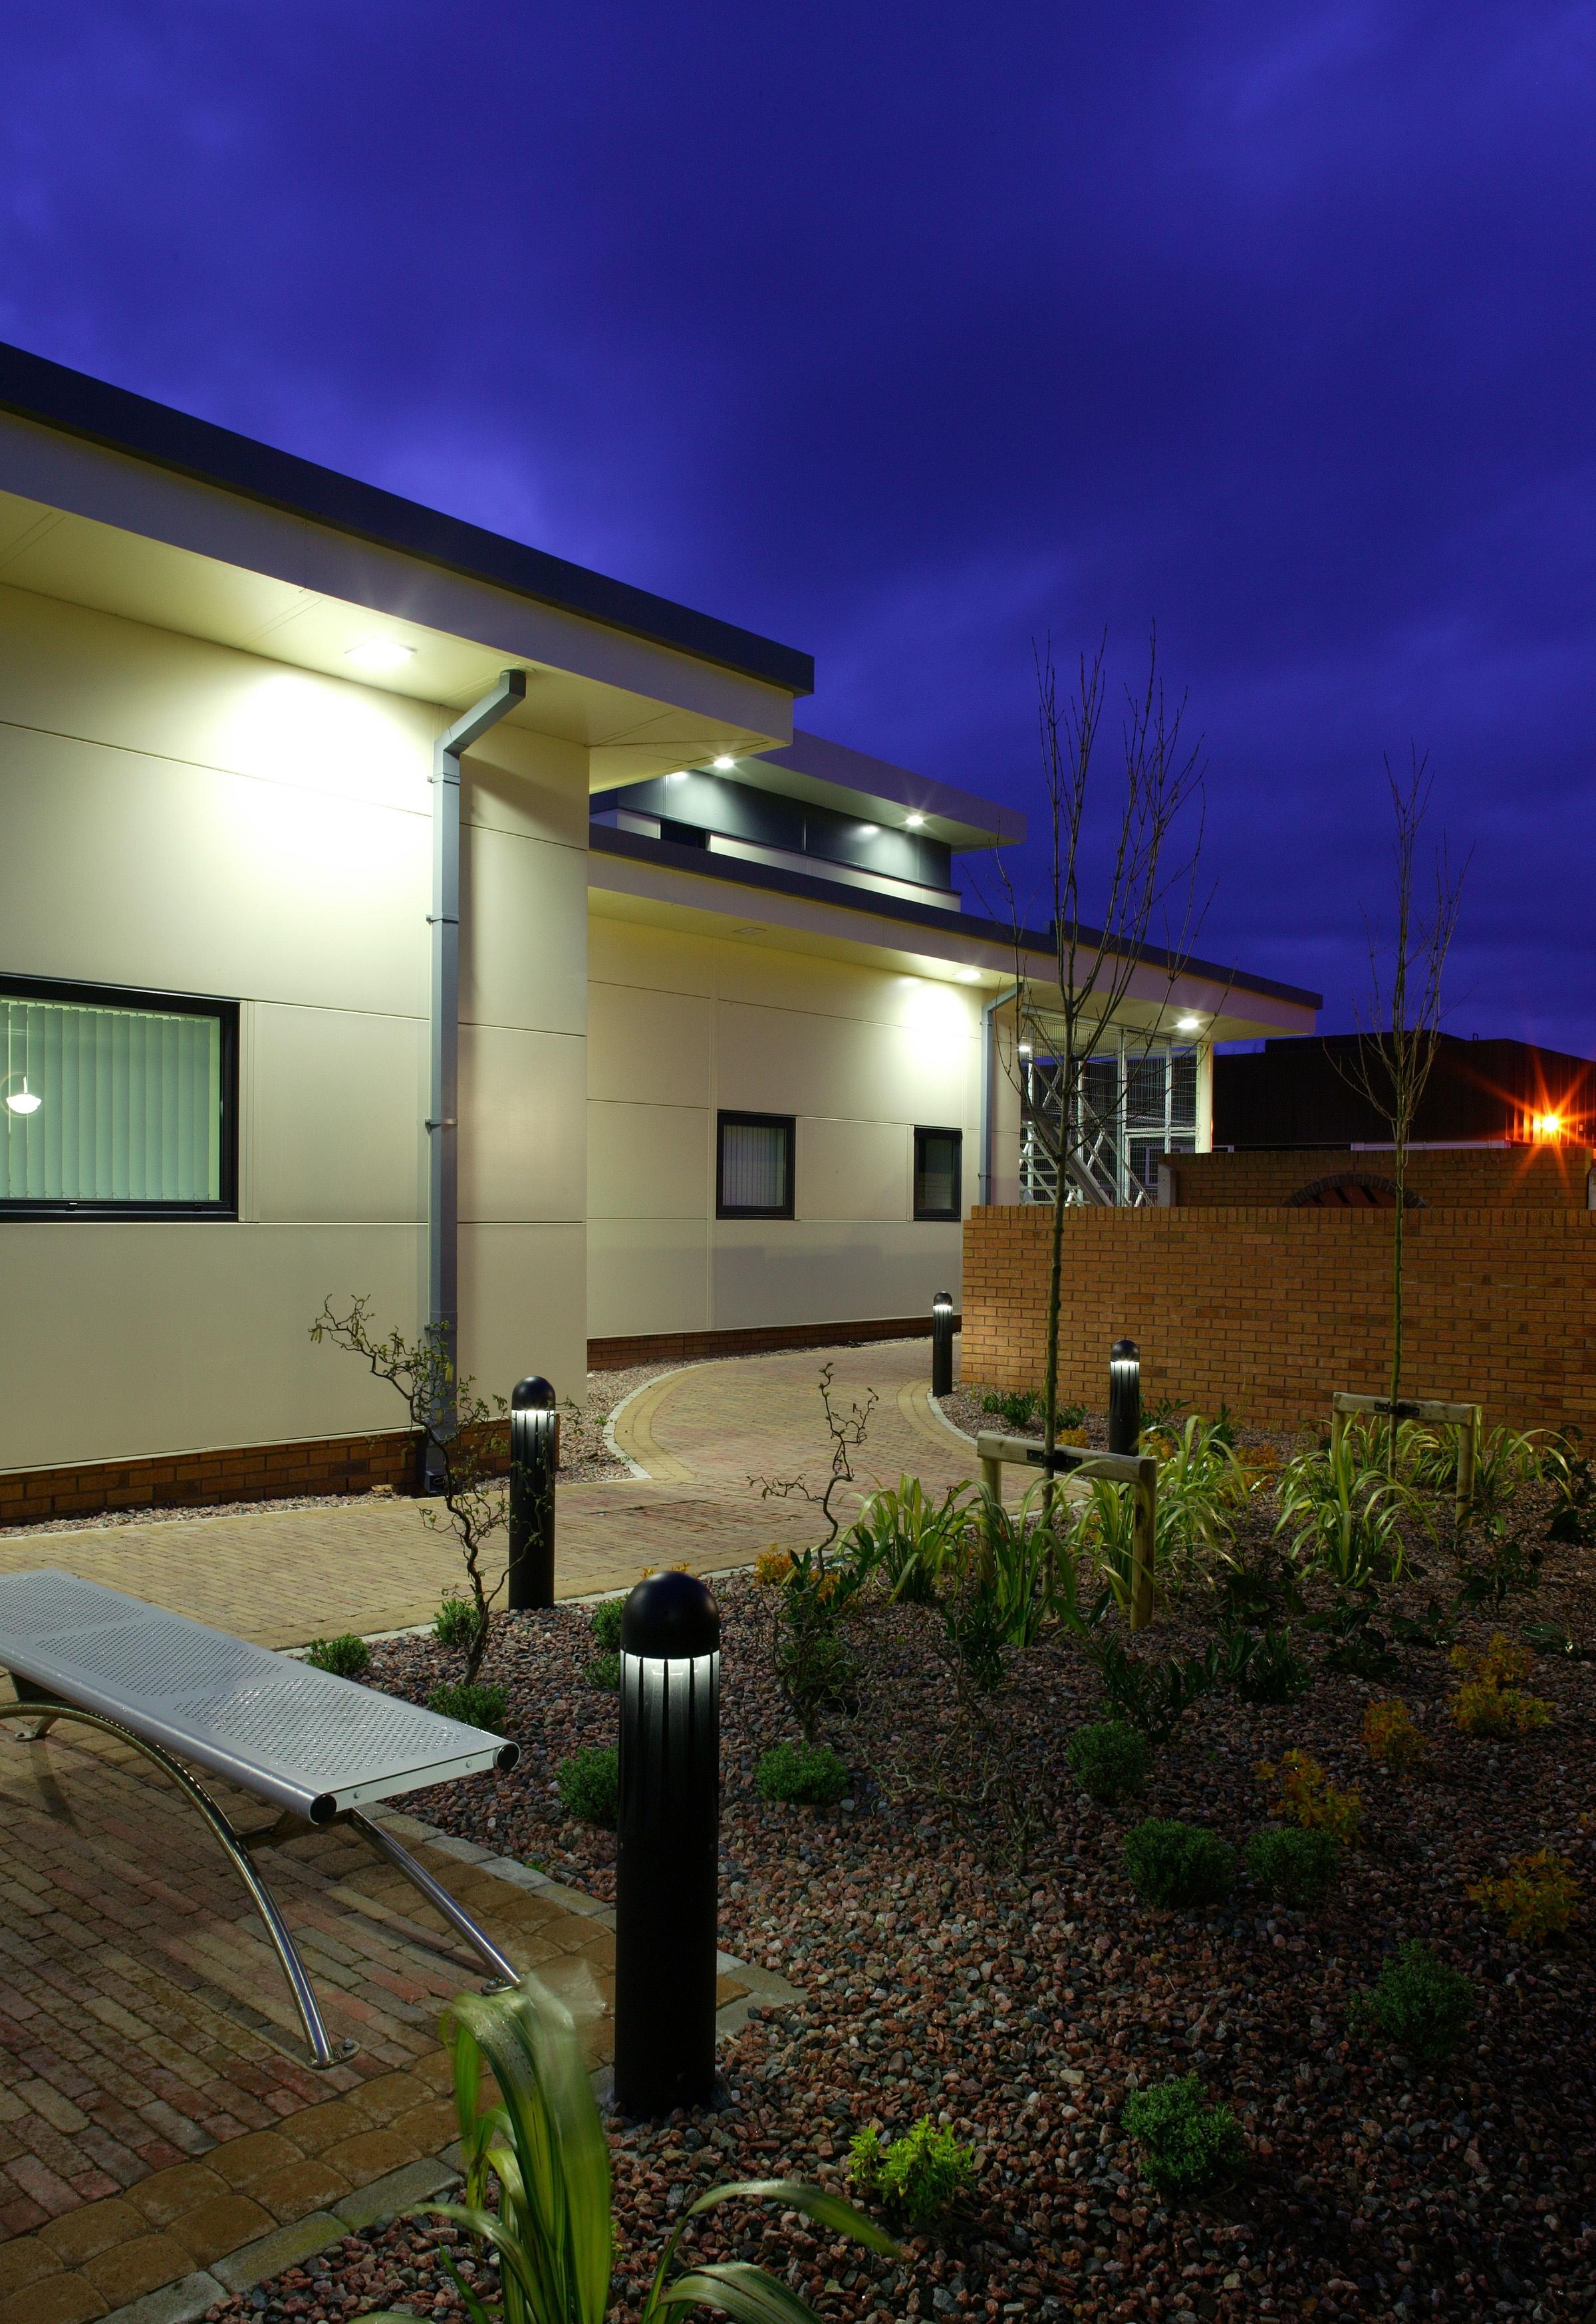 Cath Lab, Craigavon Area Hospital